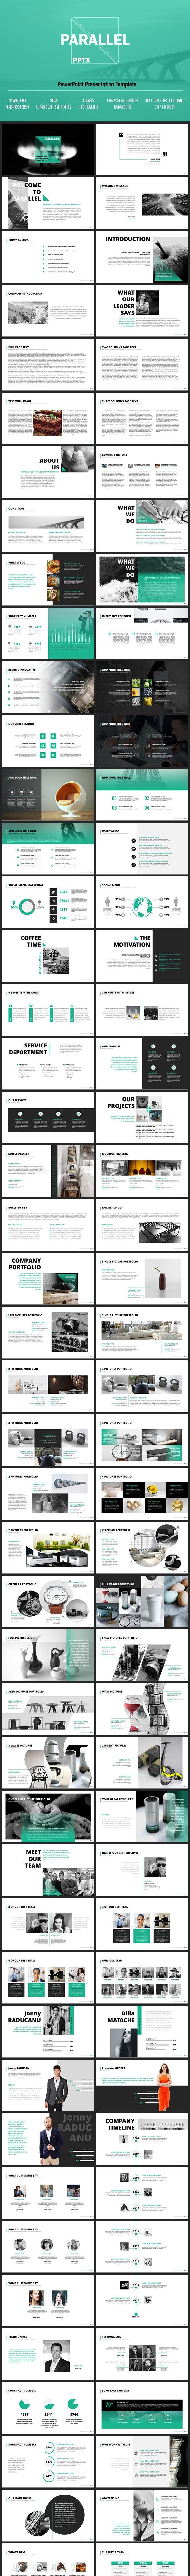 Parallel - Multipurpose PowerPoint Presentation Template - PowerPoint Templates Presentation Templates